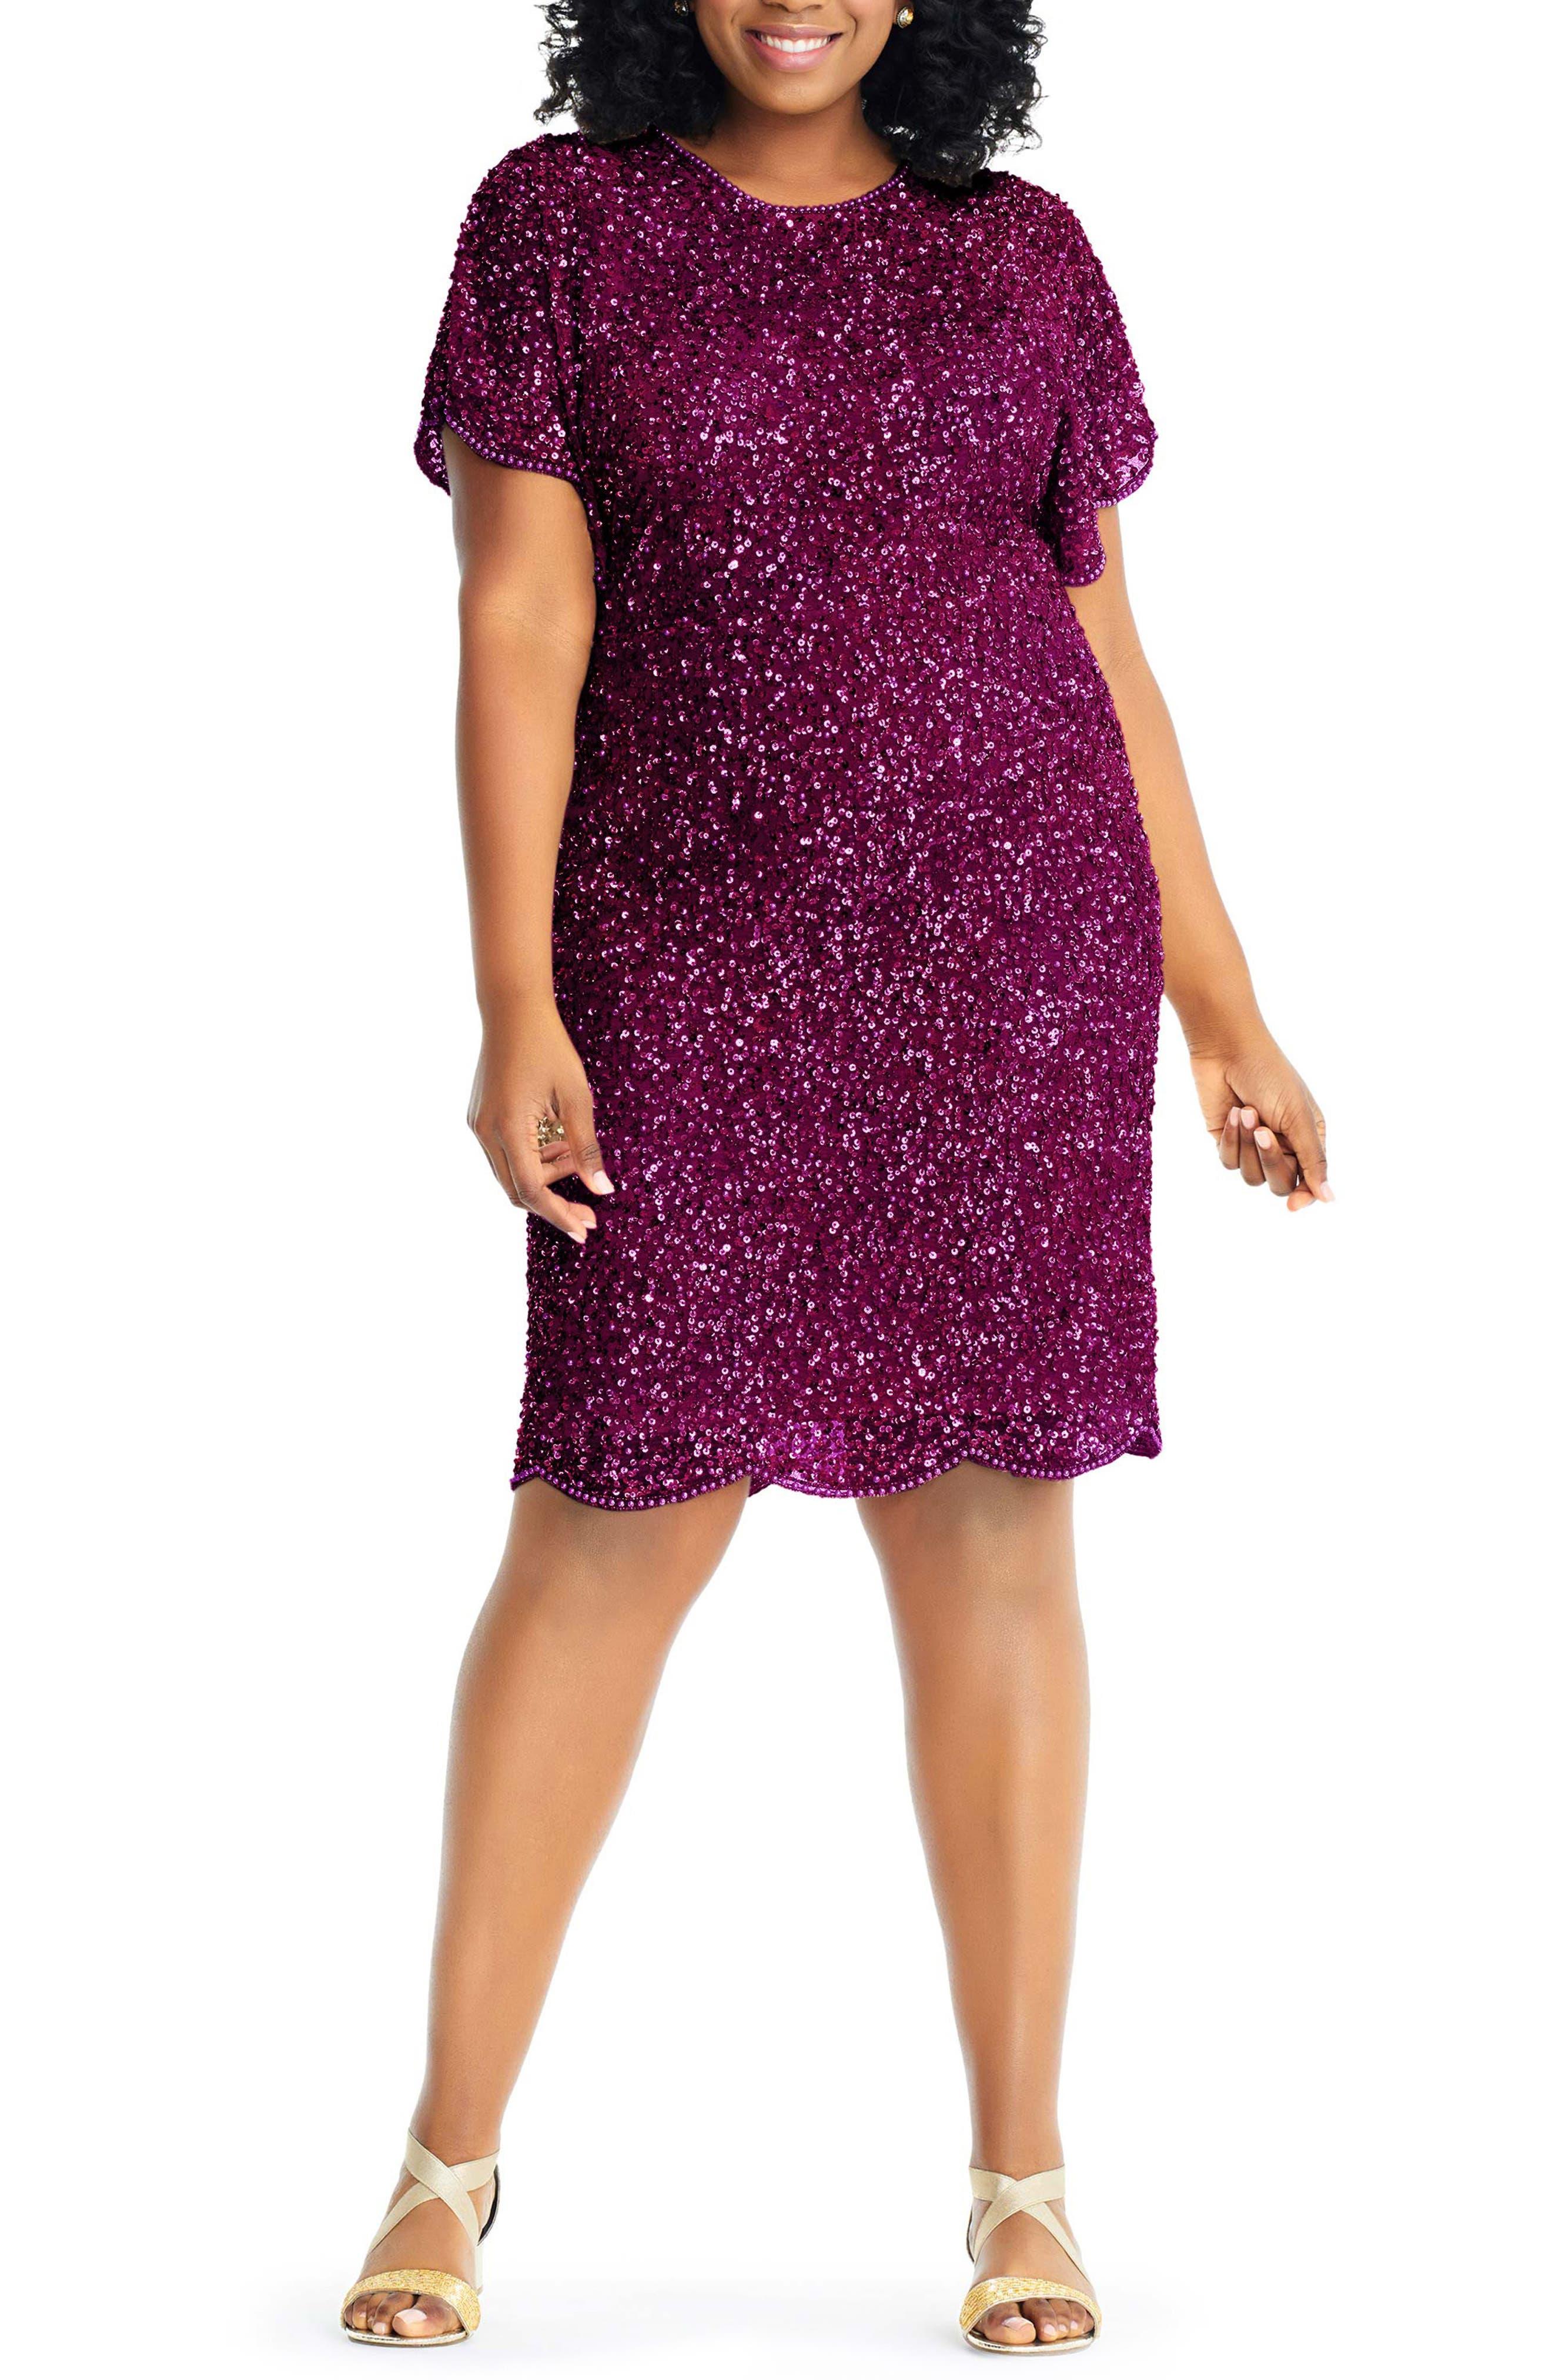 Plus Size Adrianna Papell Beaded Flutter Sleeve Sheath Dress, Burgundy